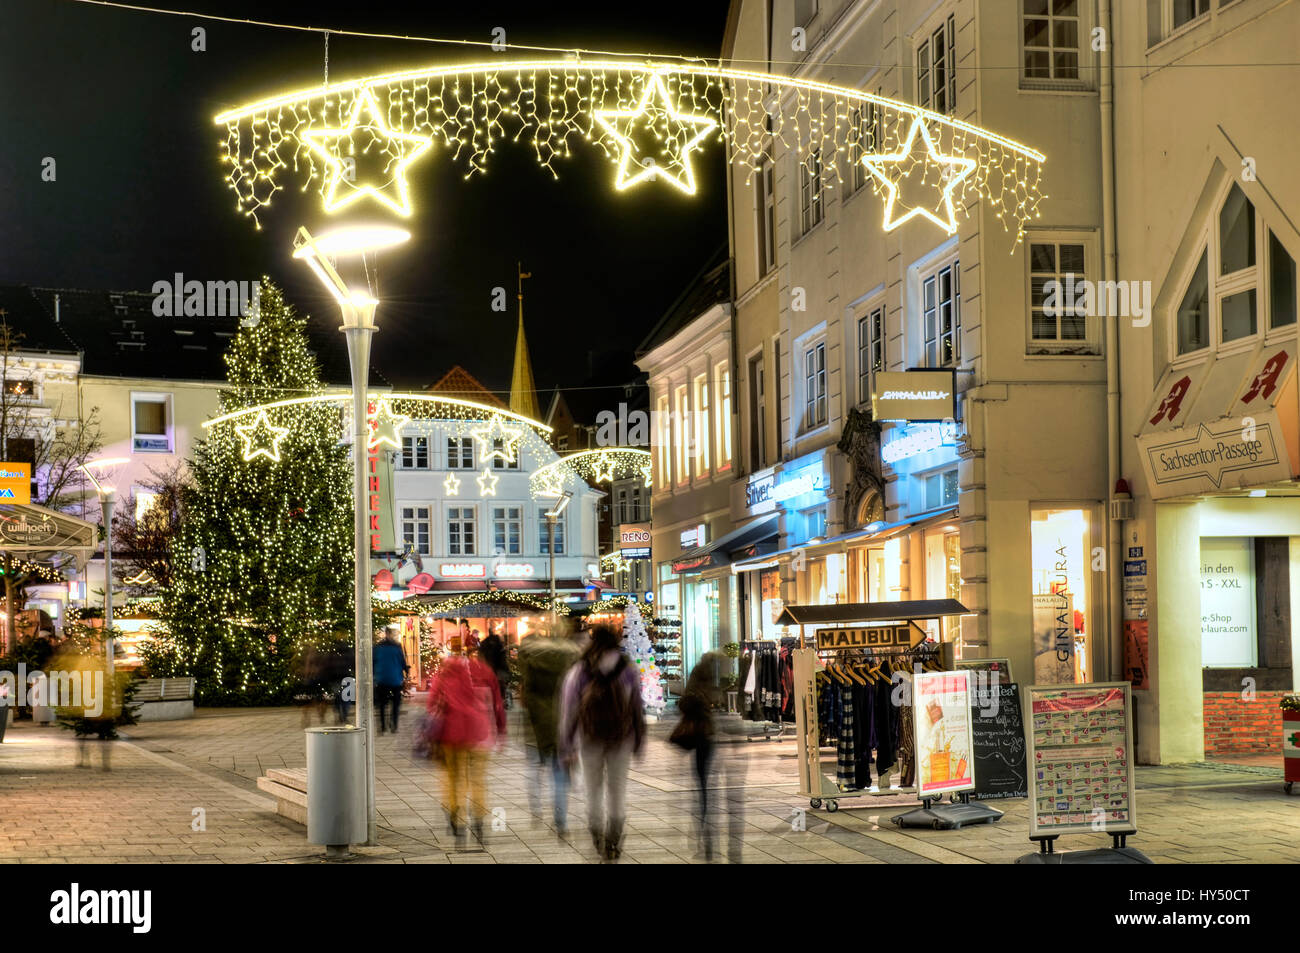 Weihnachtsbeleuchtung Xxl.Christmas Lighting In The Saxon S Gate In Mountain Village Hamburg